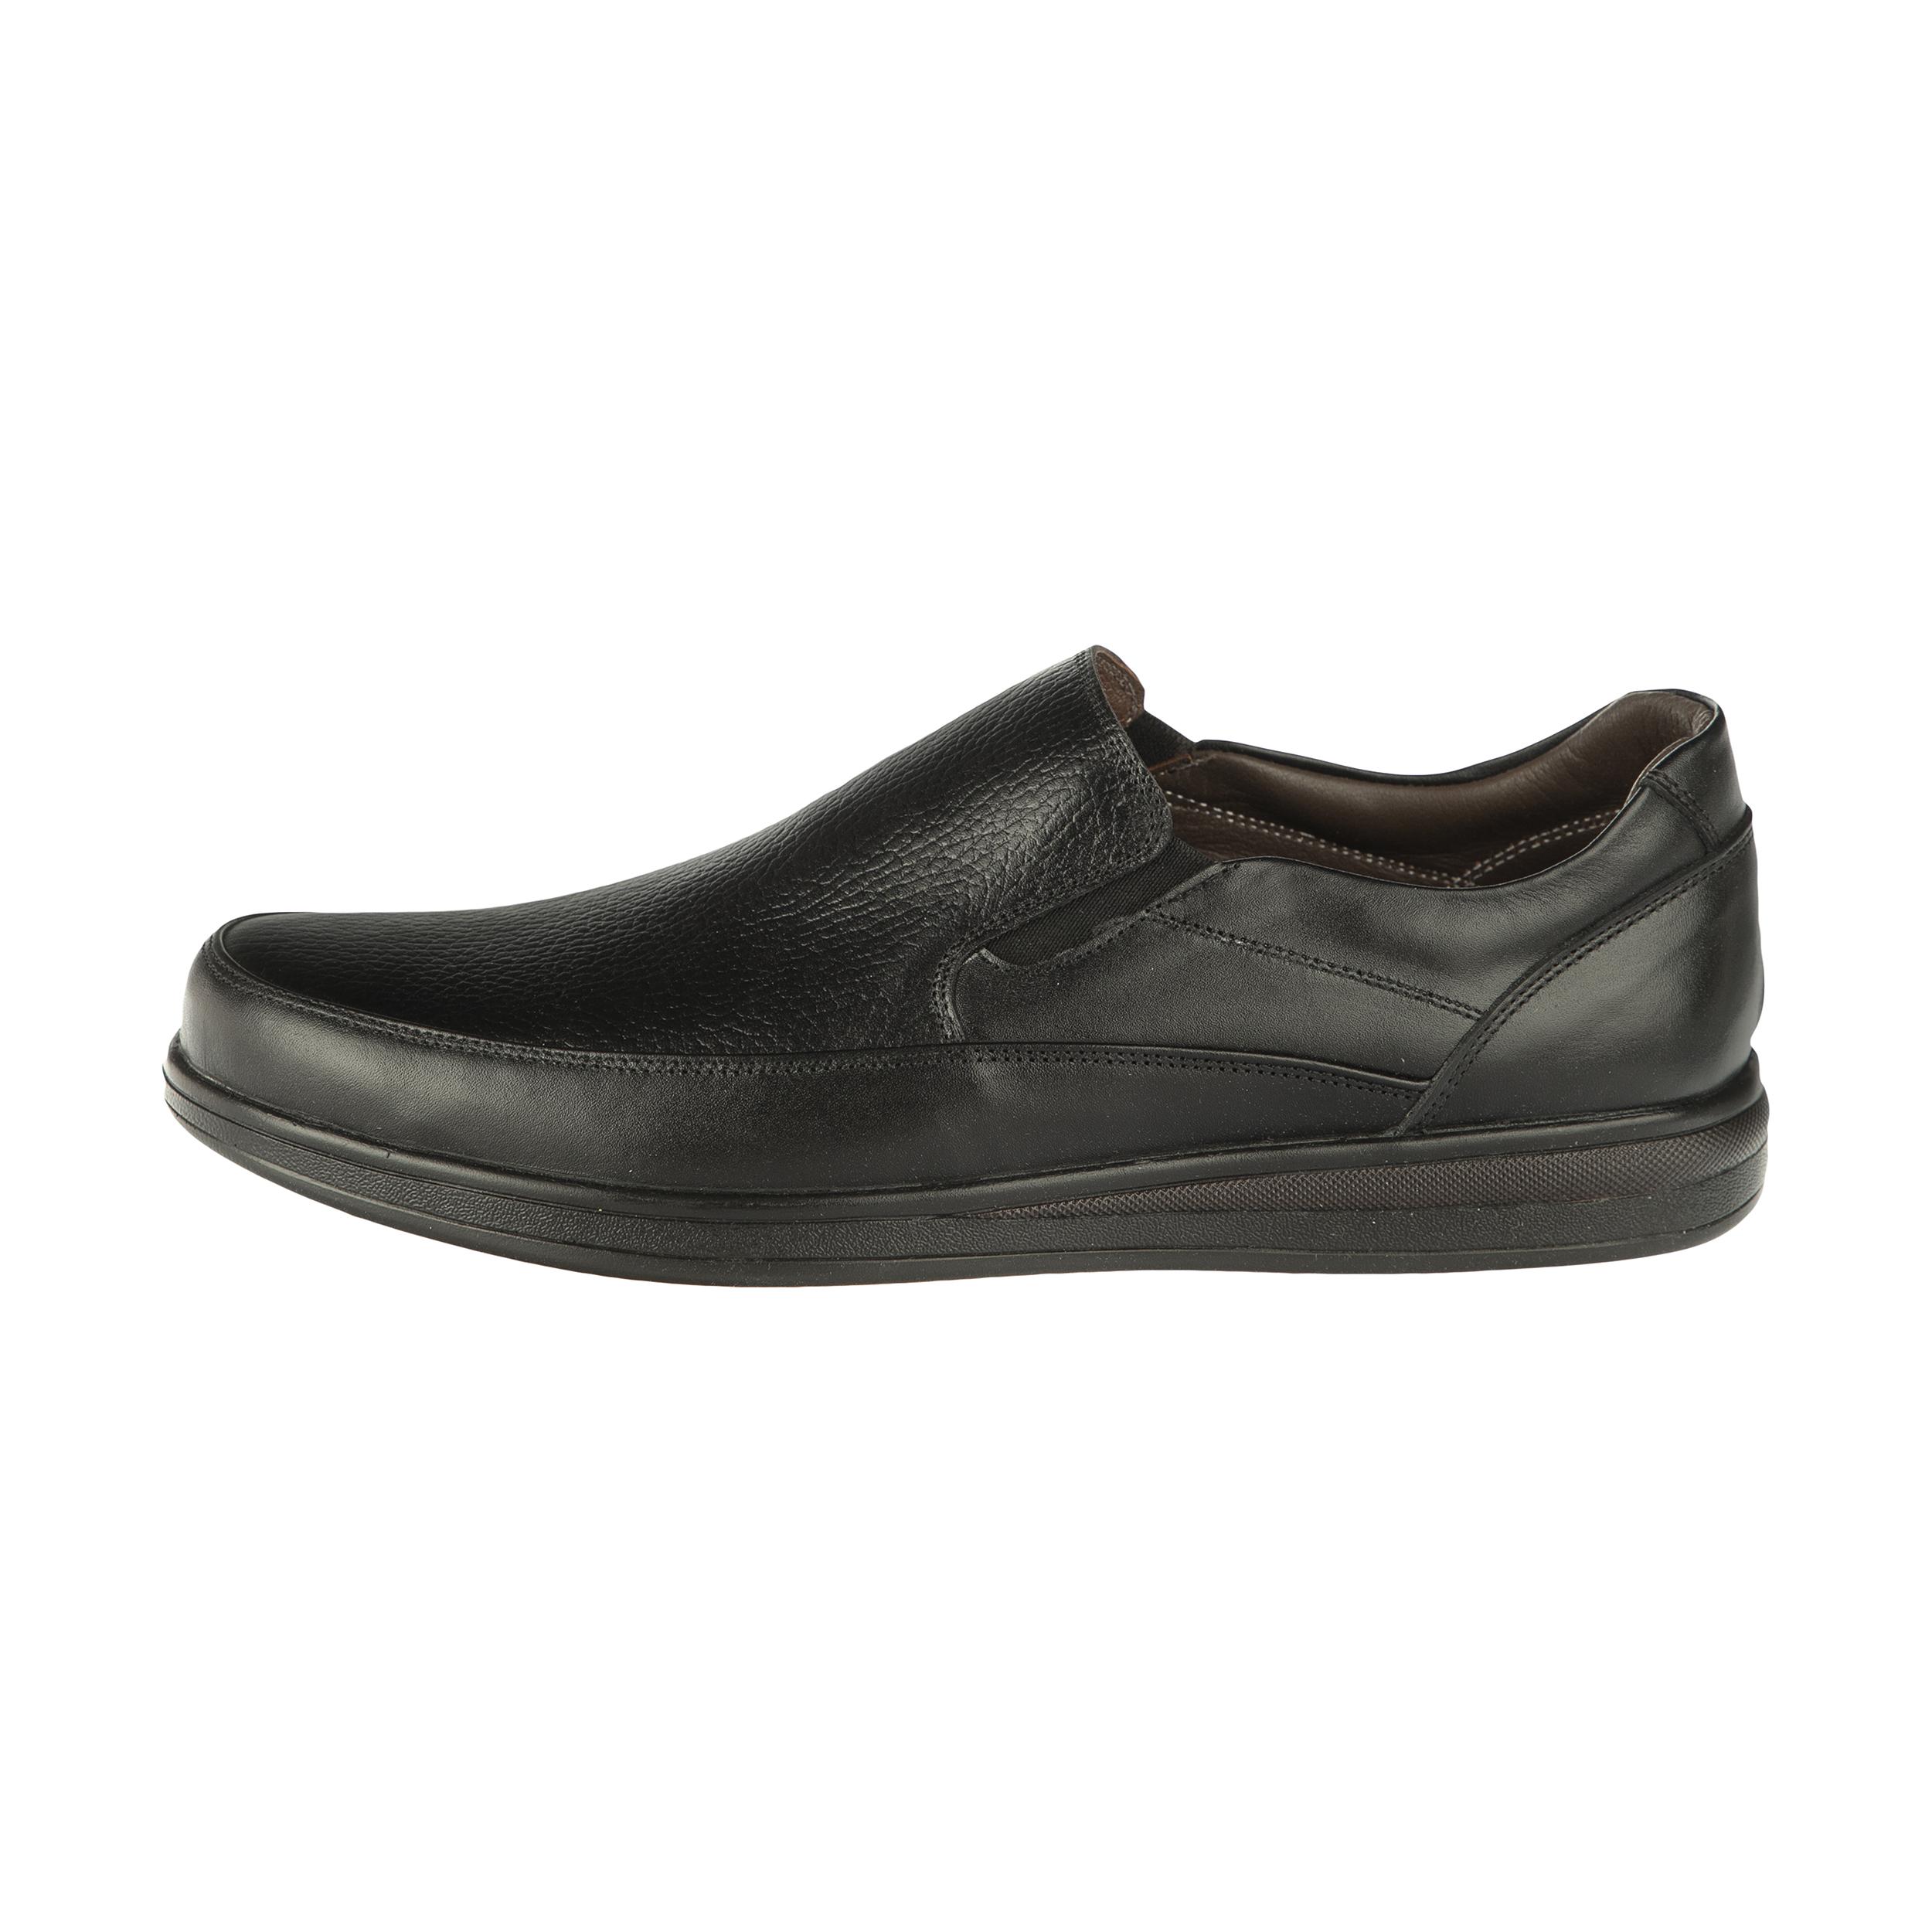 کفش روزمره مردانه ساتین مدل 7605A503101